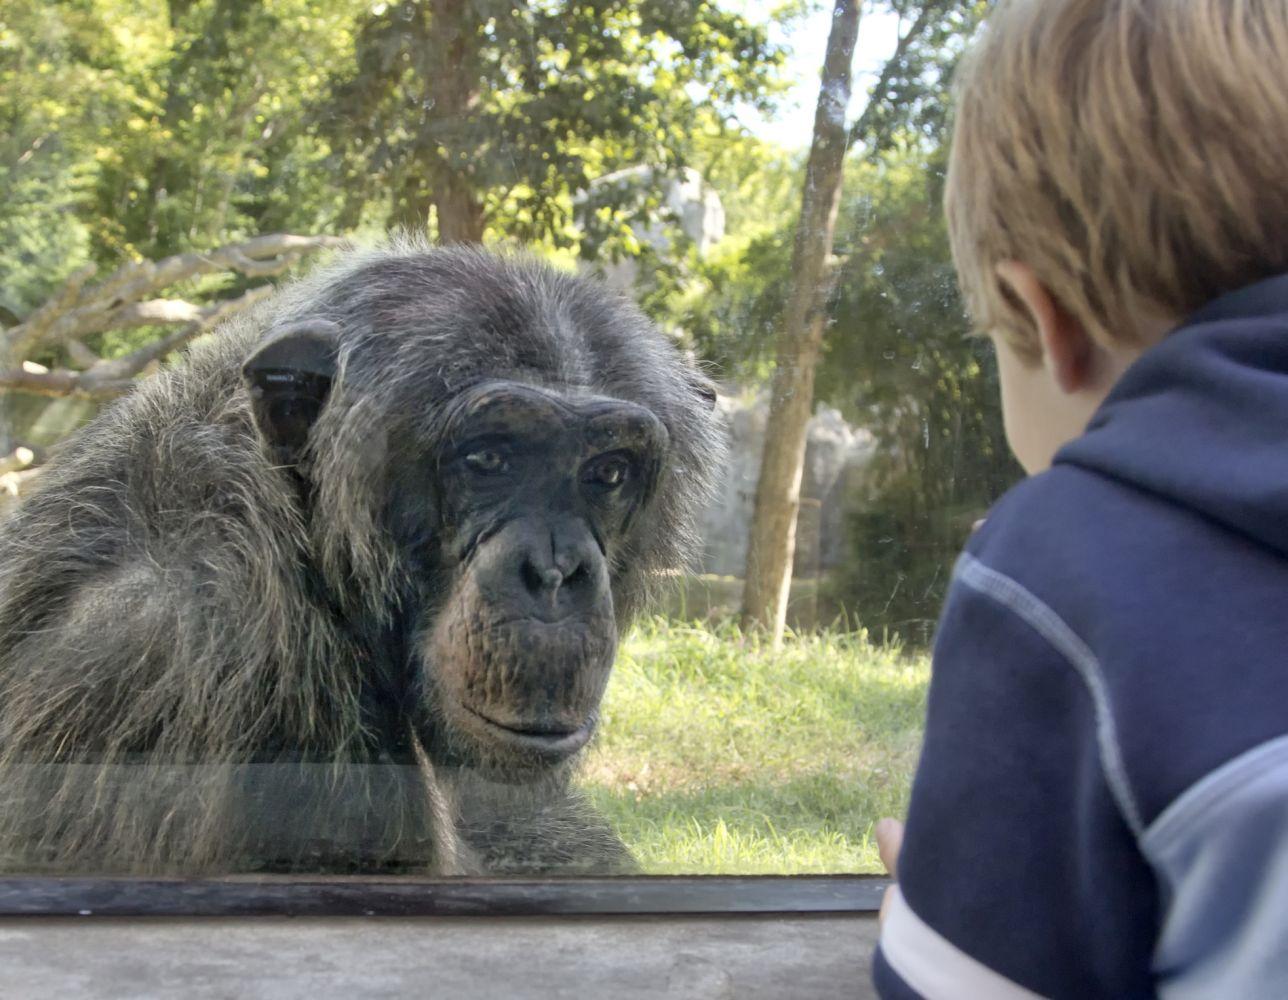 Macaco em zoológico